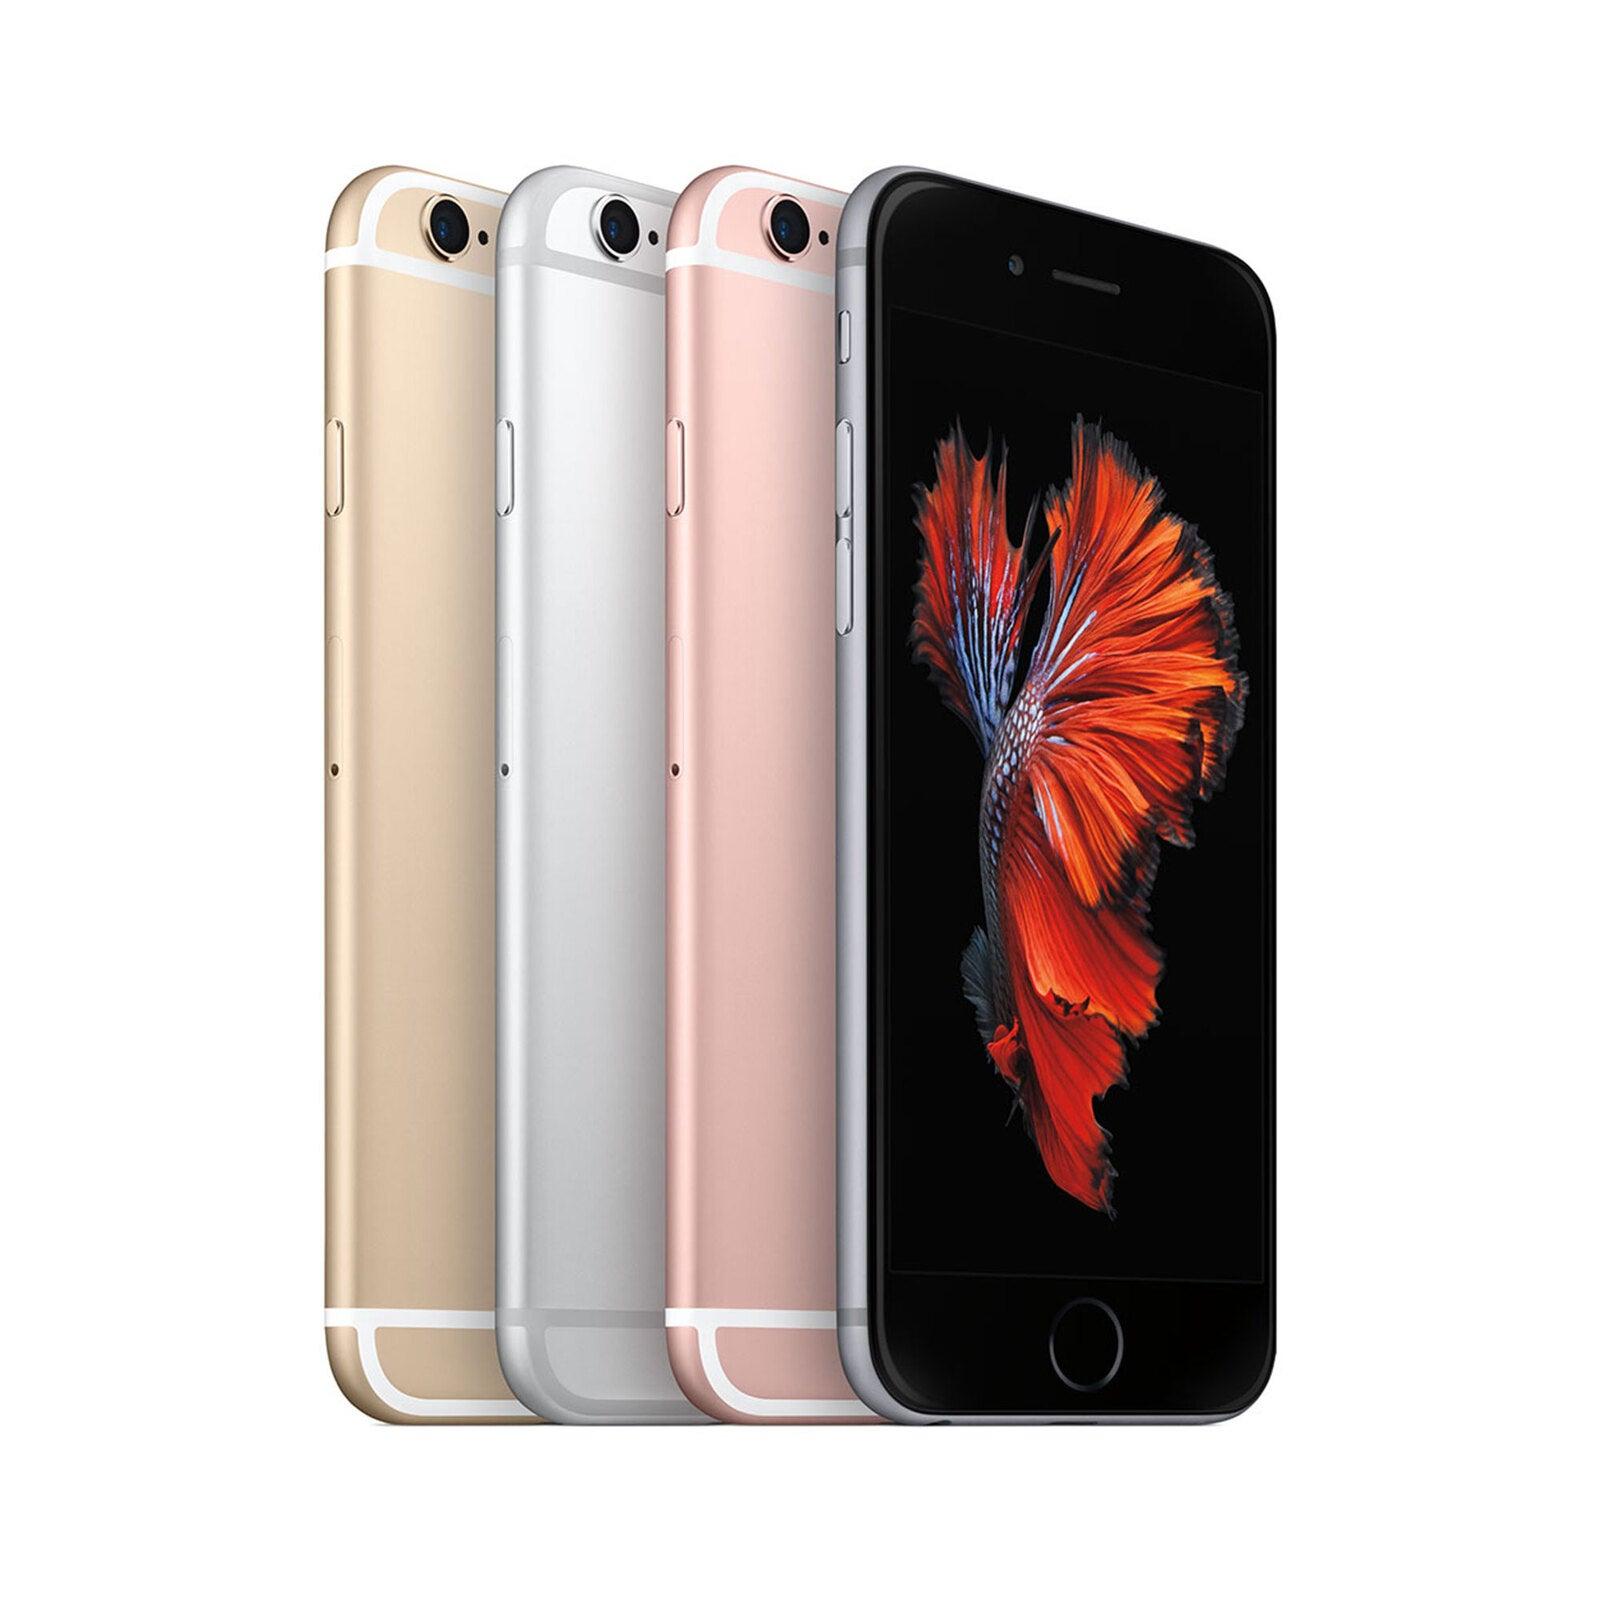 Apple iPhone 6S 16GB (Refurbished)